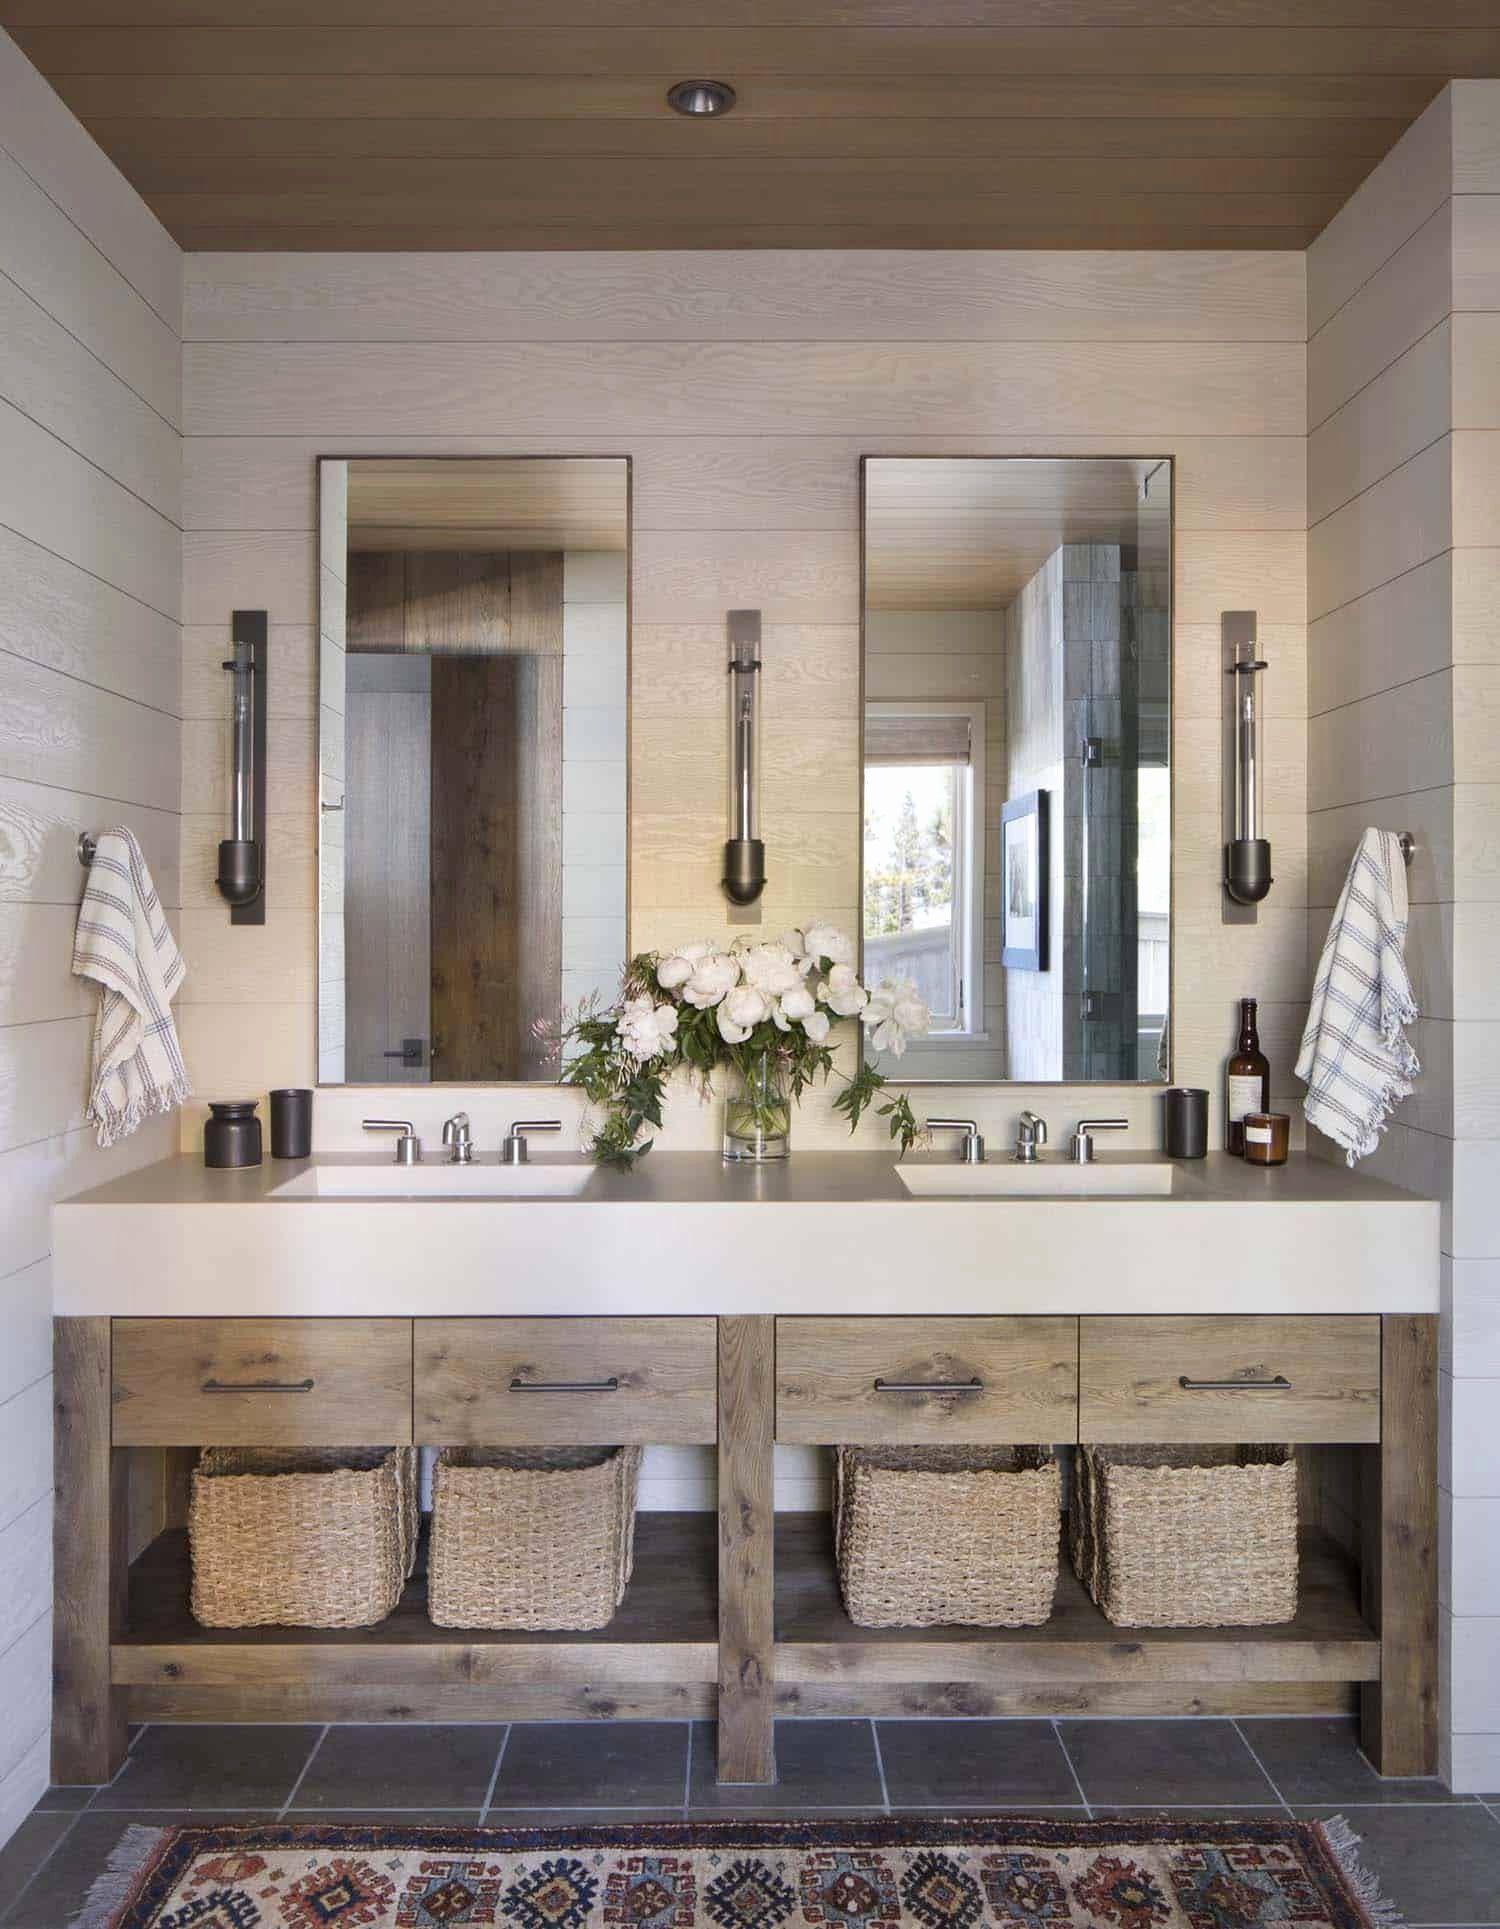 Bathroom Decor New Rustic Lake House, Lake Cabin Bathroom Decor